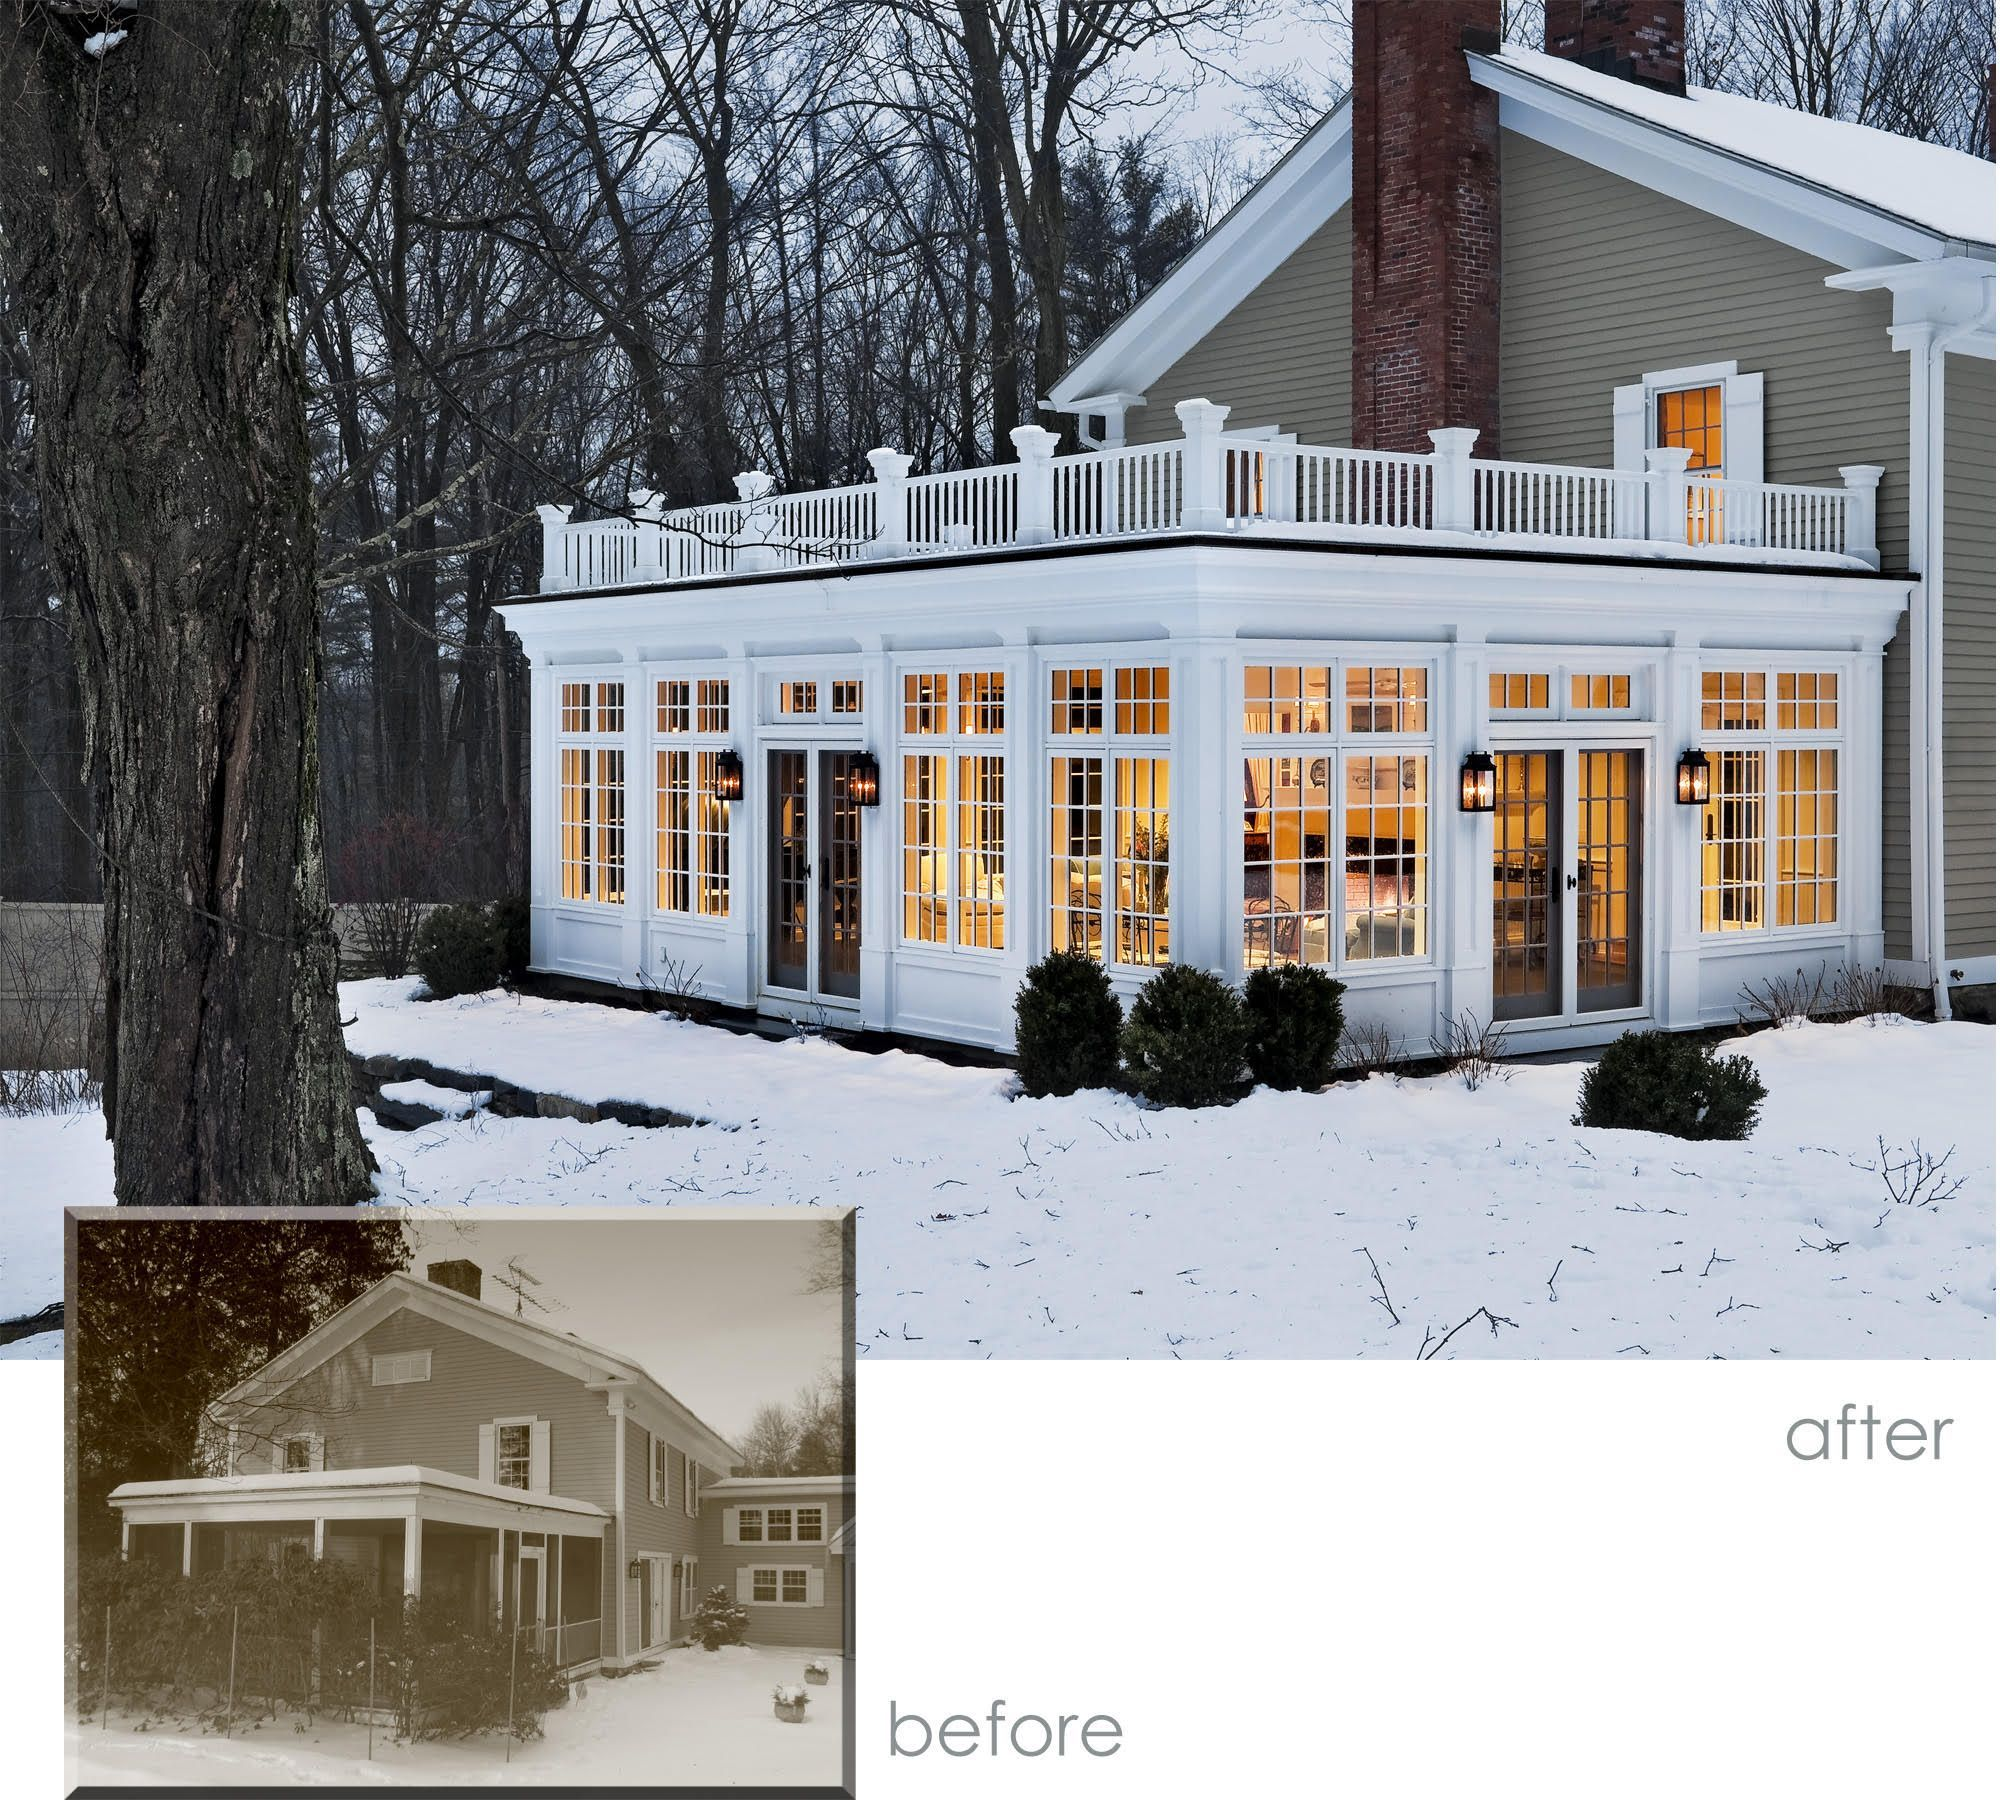 Interior Sunroom Addition Ideas: Inspiring Sunroom Design Tips And Ideas